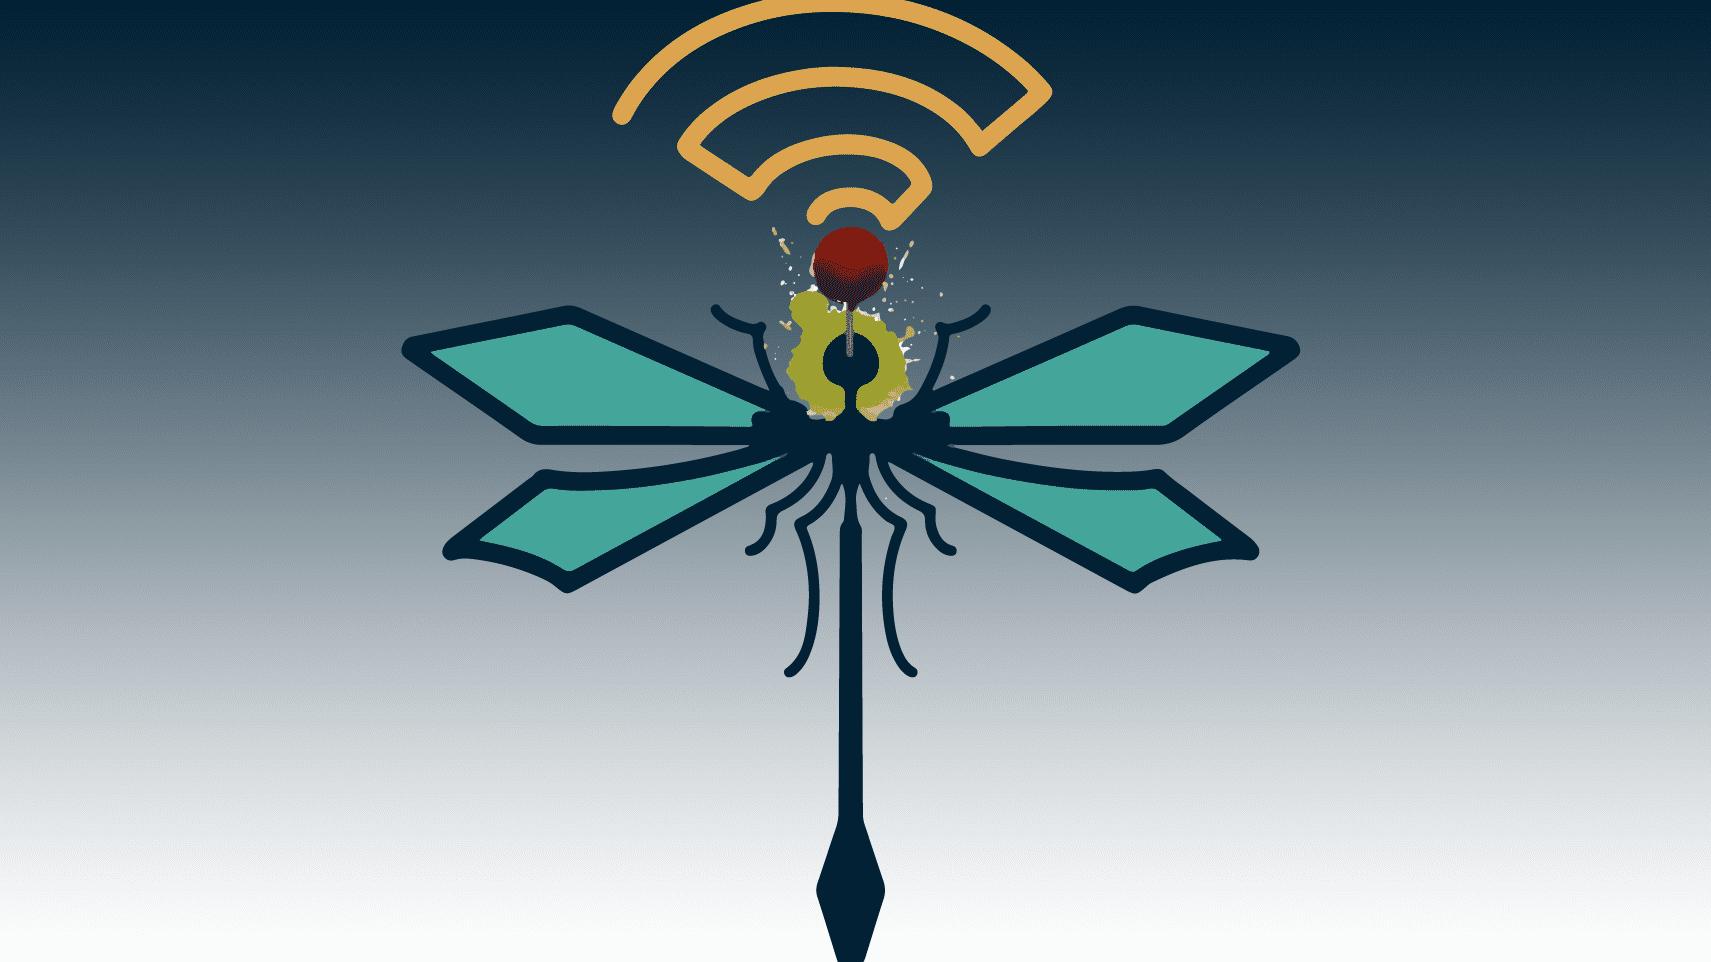 Dragonblood: Angreifer können bei WPA 3 unter Umständen WLAN-Passwörter knacken